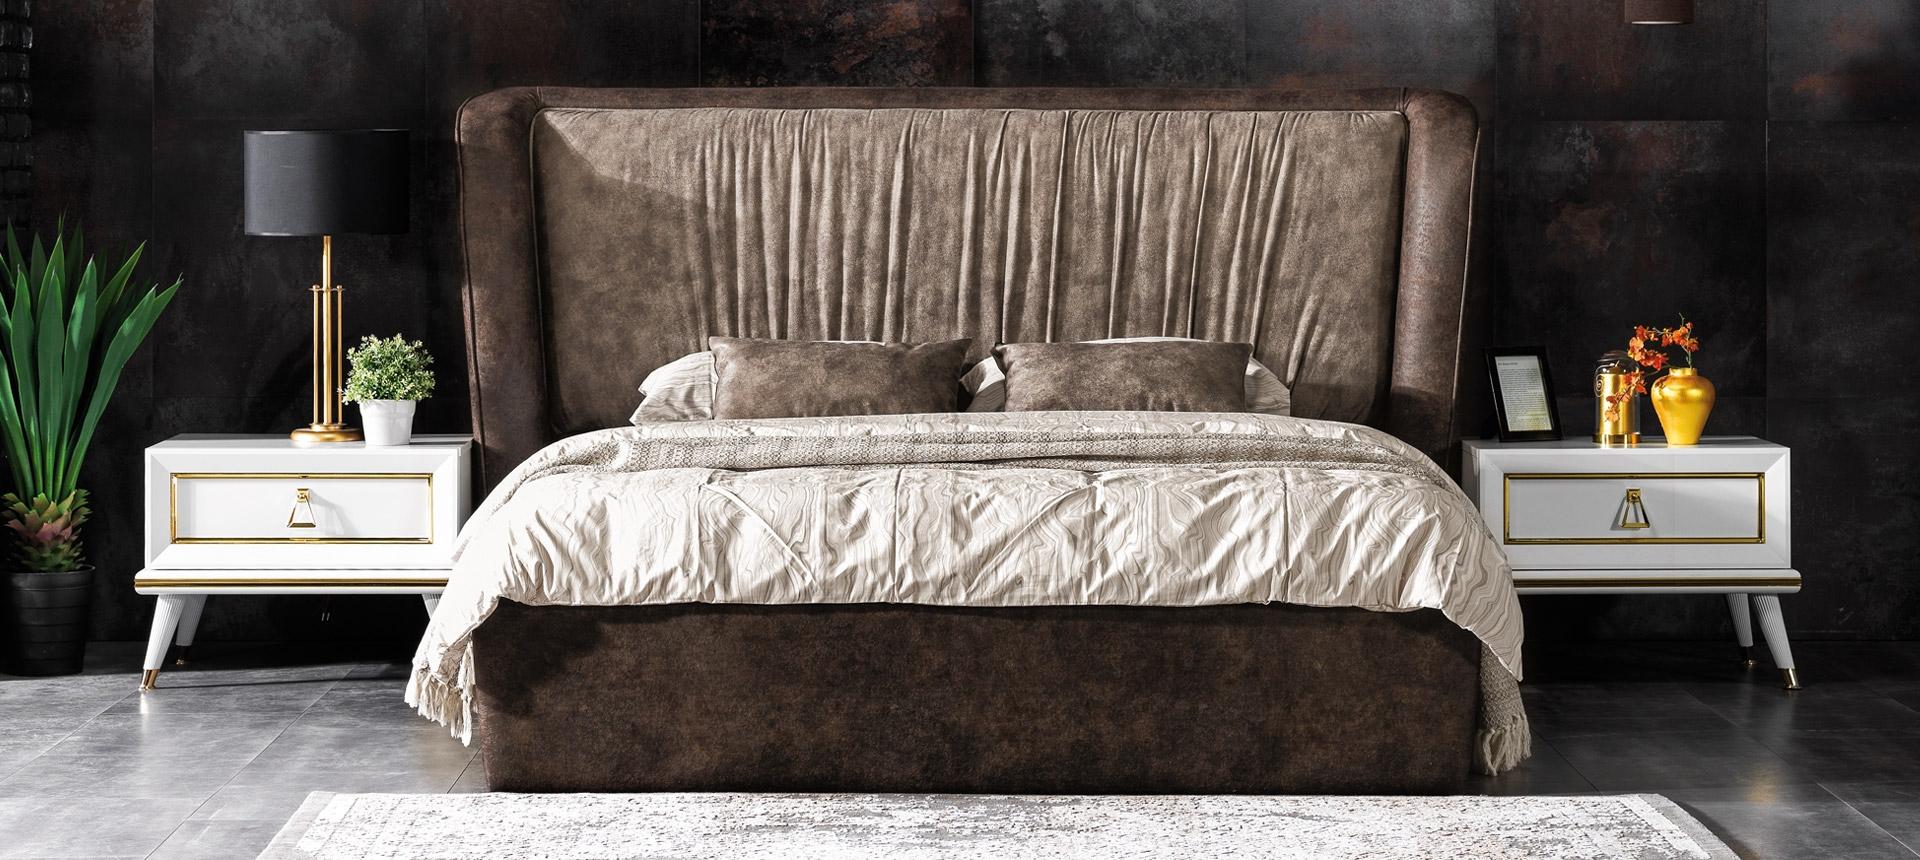 Pat tapitat cu stofa Toscana Maro, 200 x 160 cm somproduct.ro